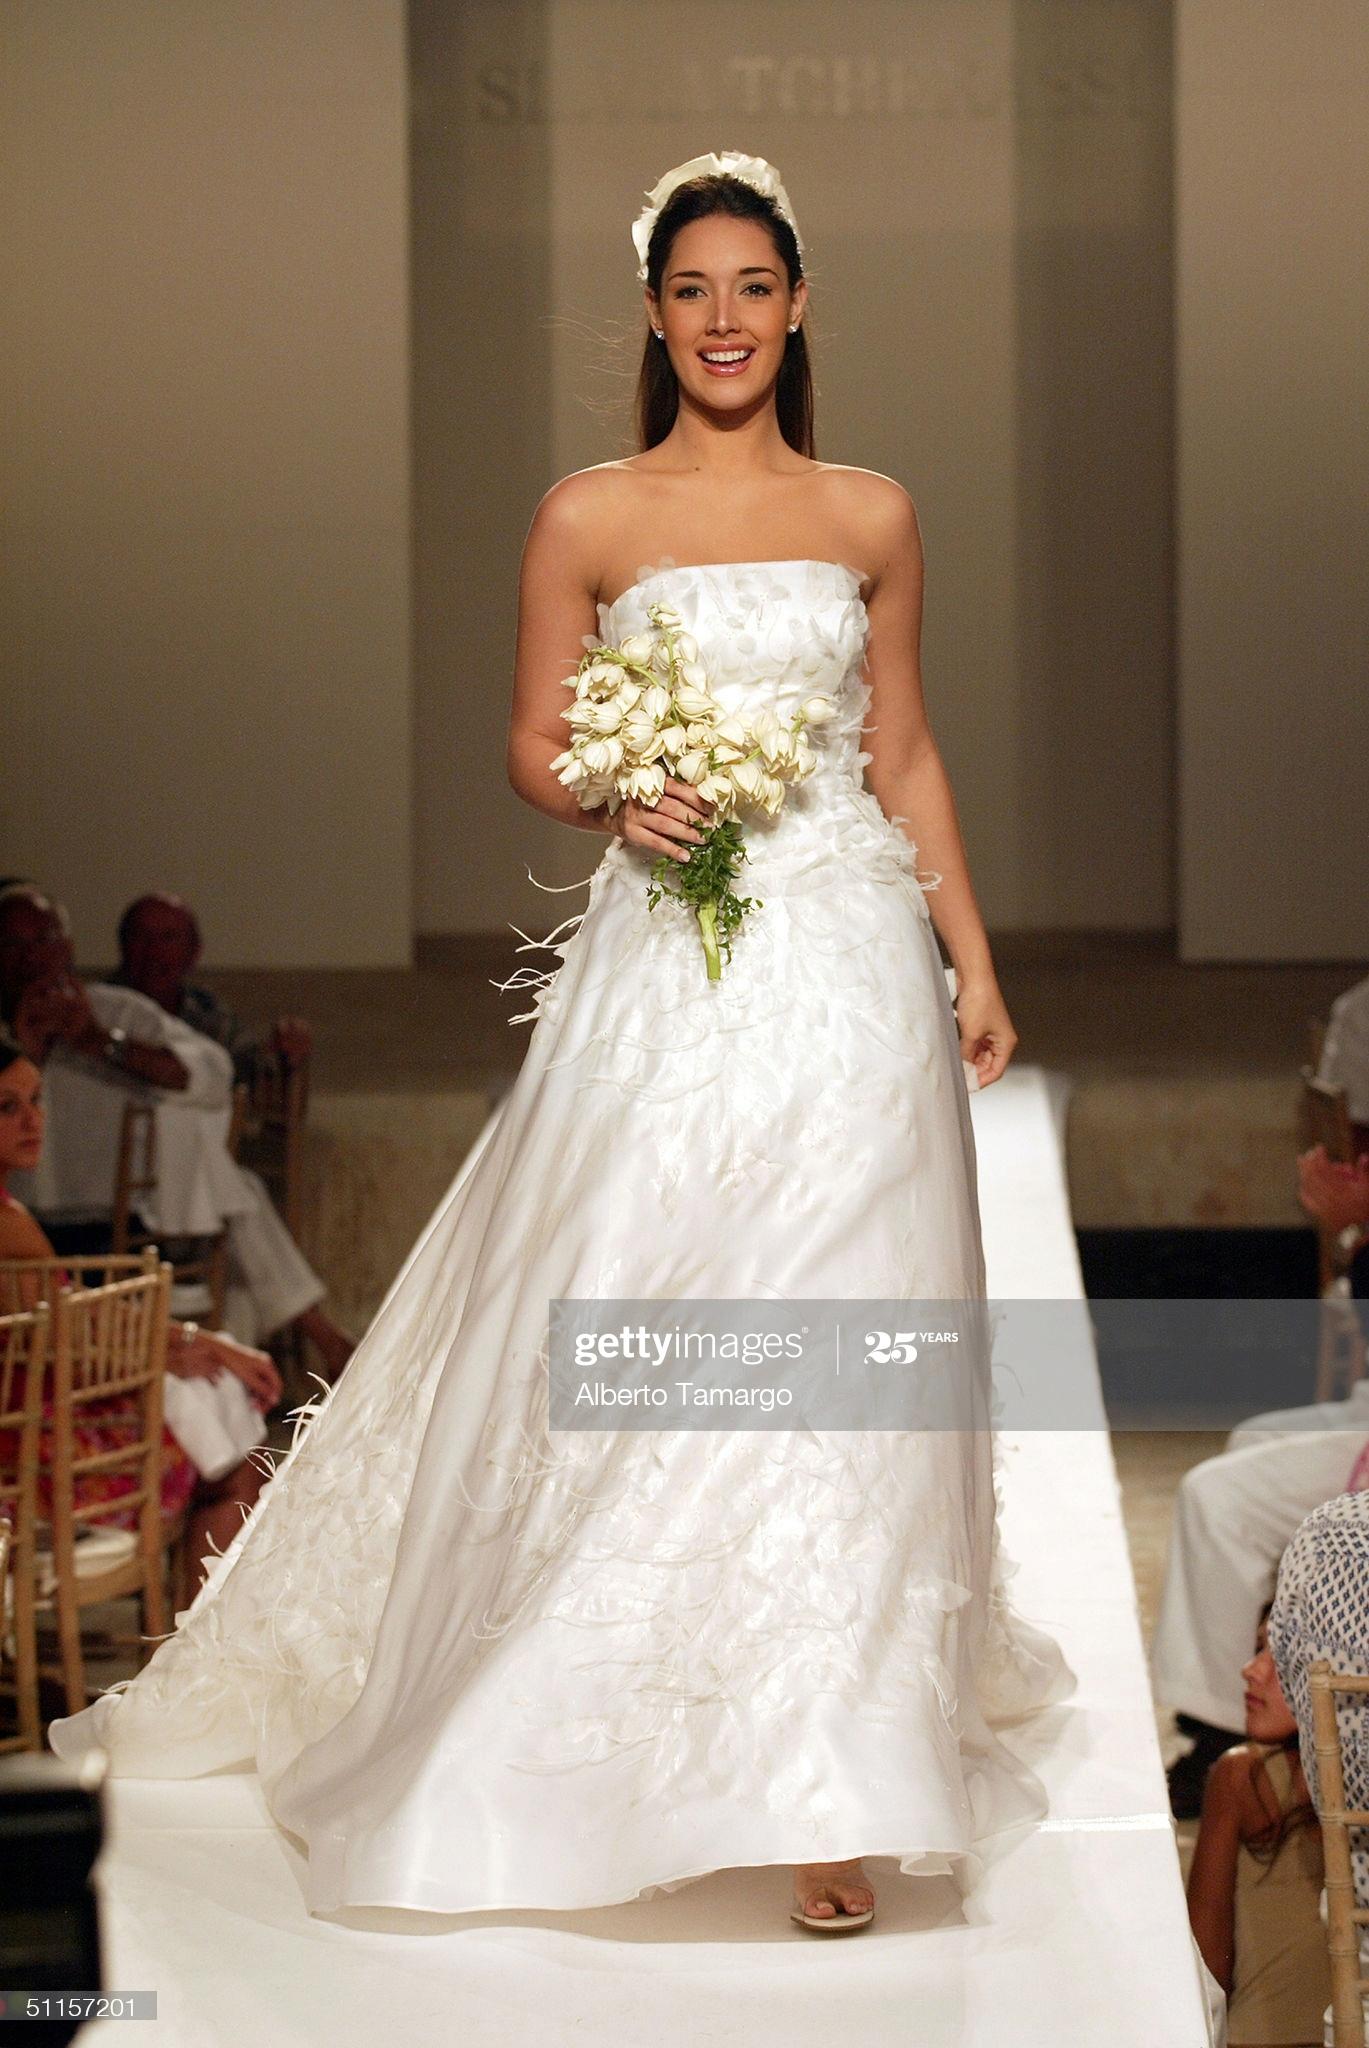 ════ ∘◦❁◦∘ ════ Amelia Vega, Miss Universe 2003. ════ ∘◦❁◦∘ ════ - Página 13 Former12